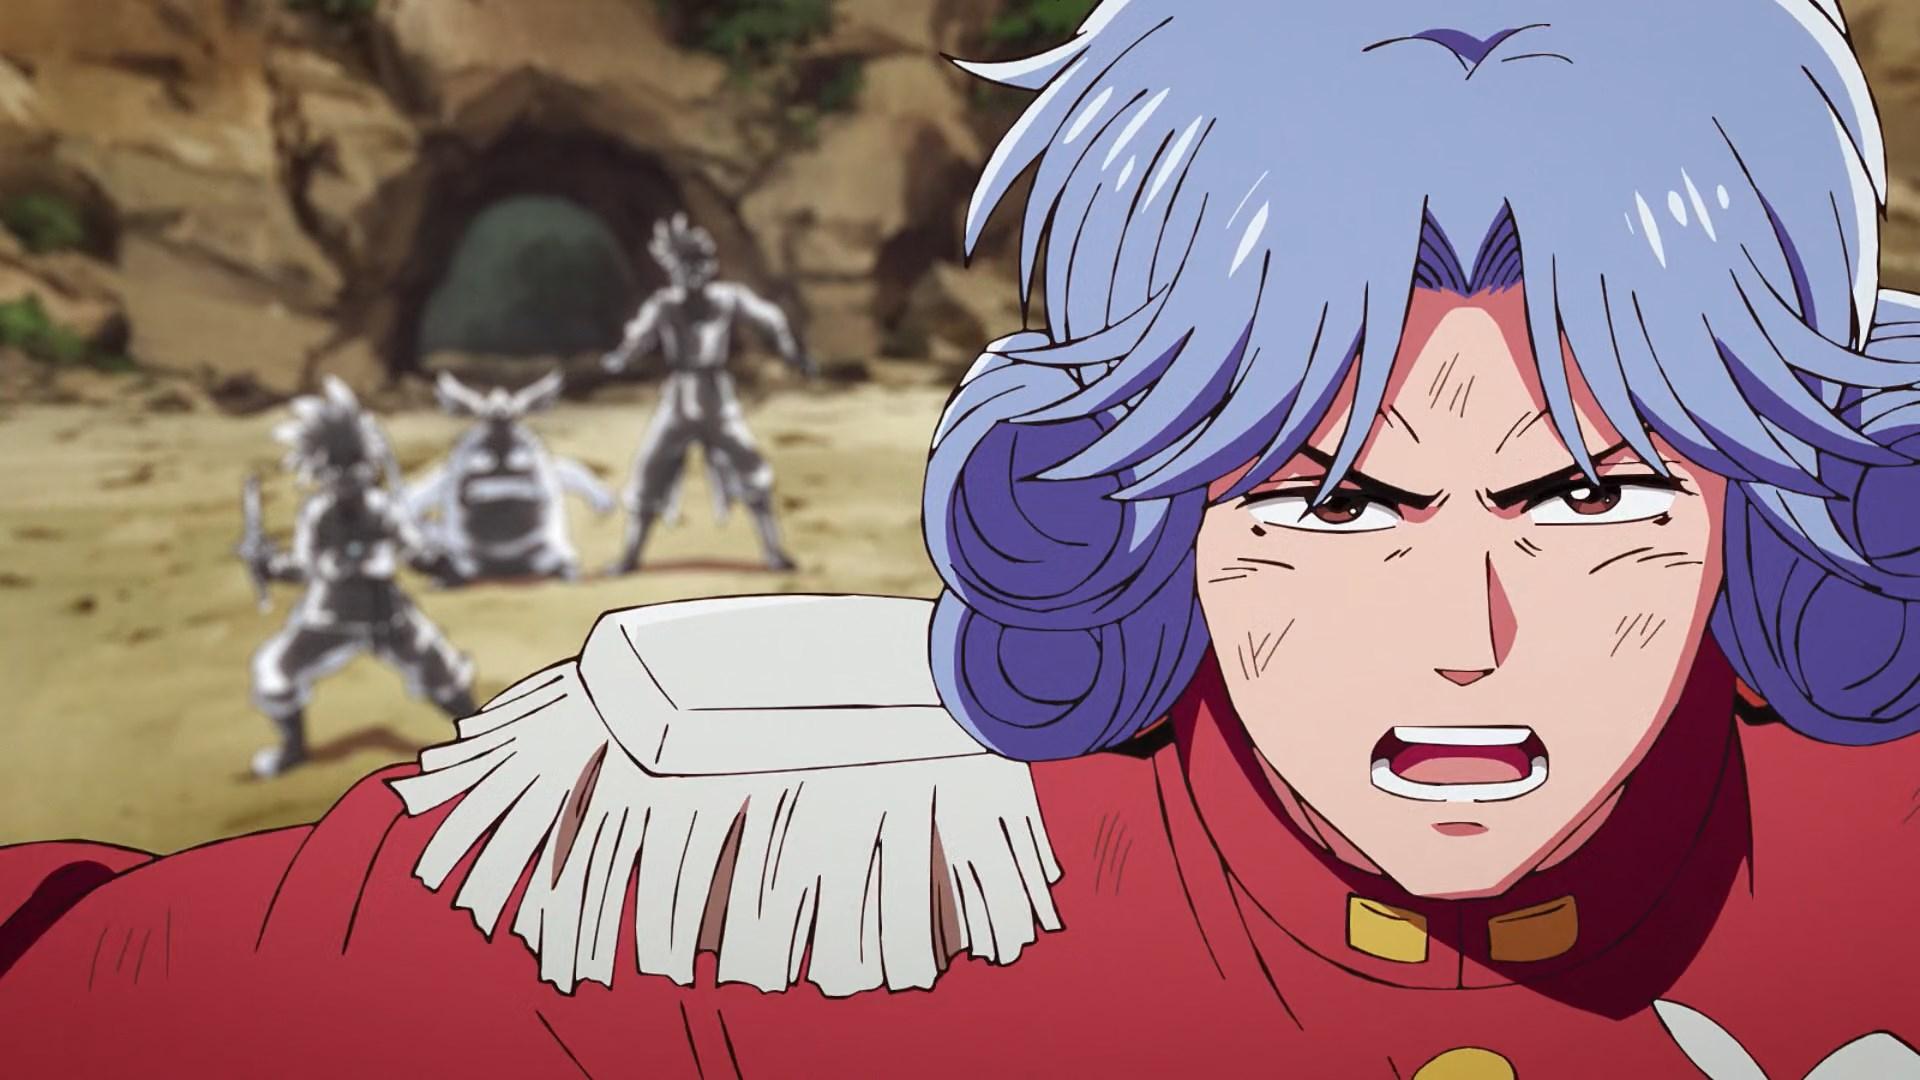 Dragon Quest: Dai no Daibouken (2020) Episode 05 Subtitle Indonesia